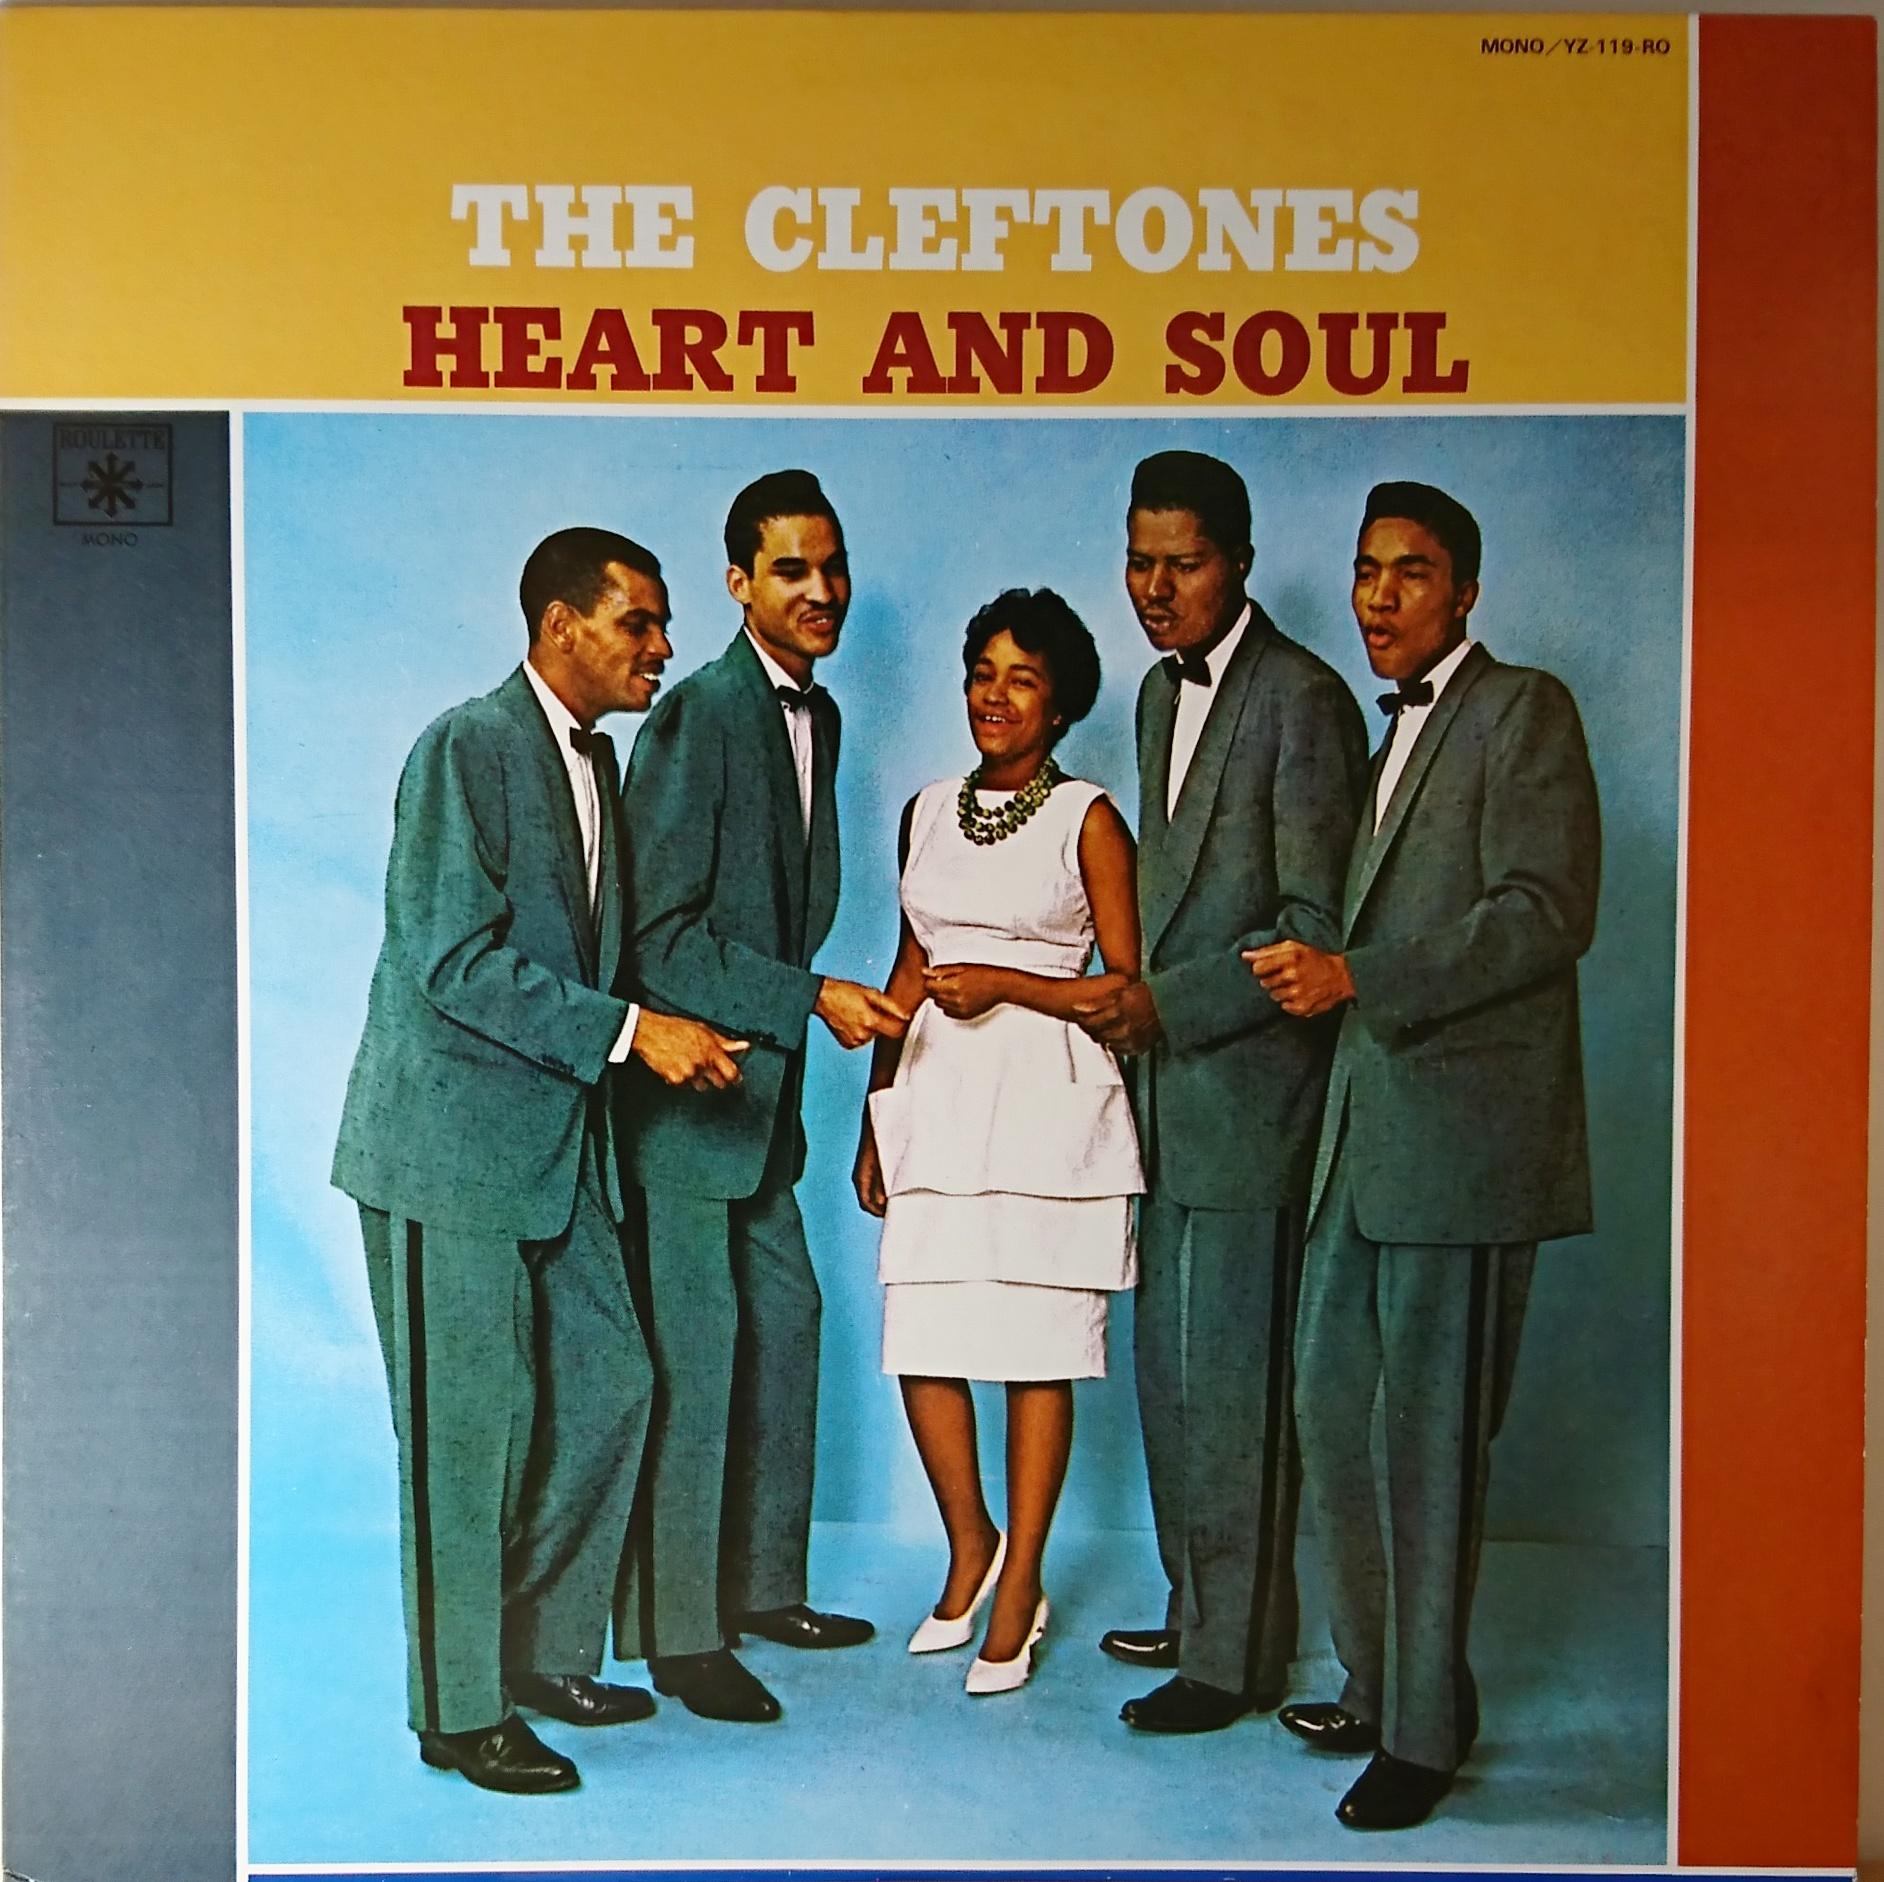 The Cleftones – Heart And Soul | 中古レコード通販・買取のアカル・レコーズ